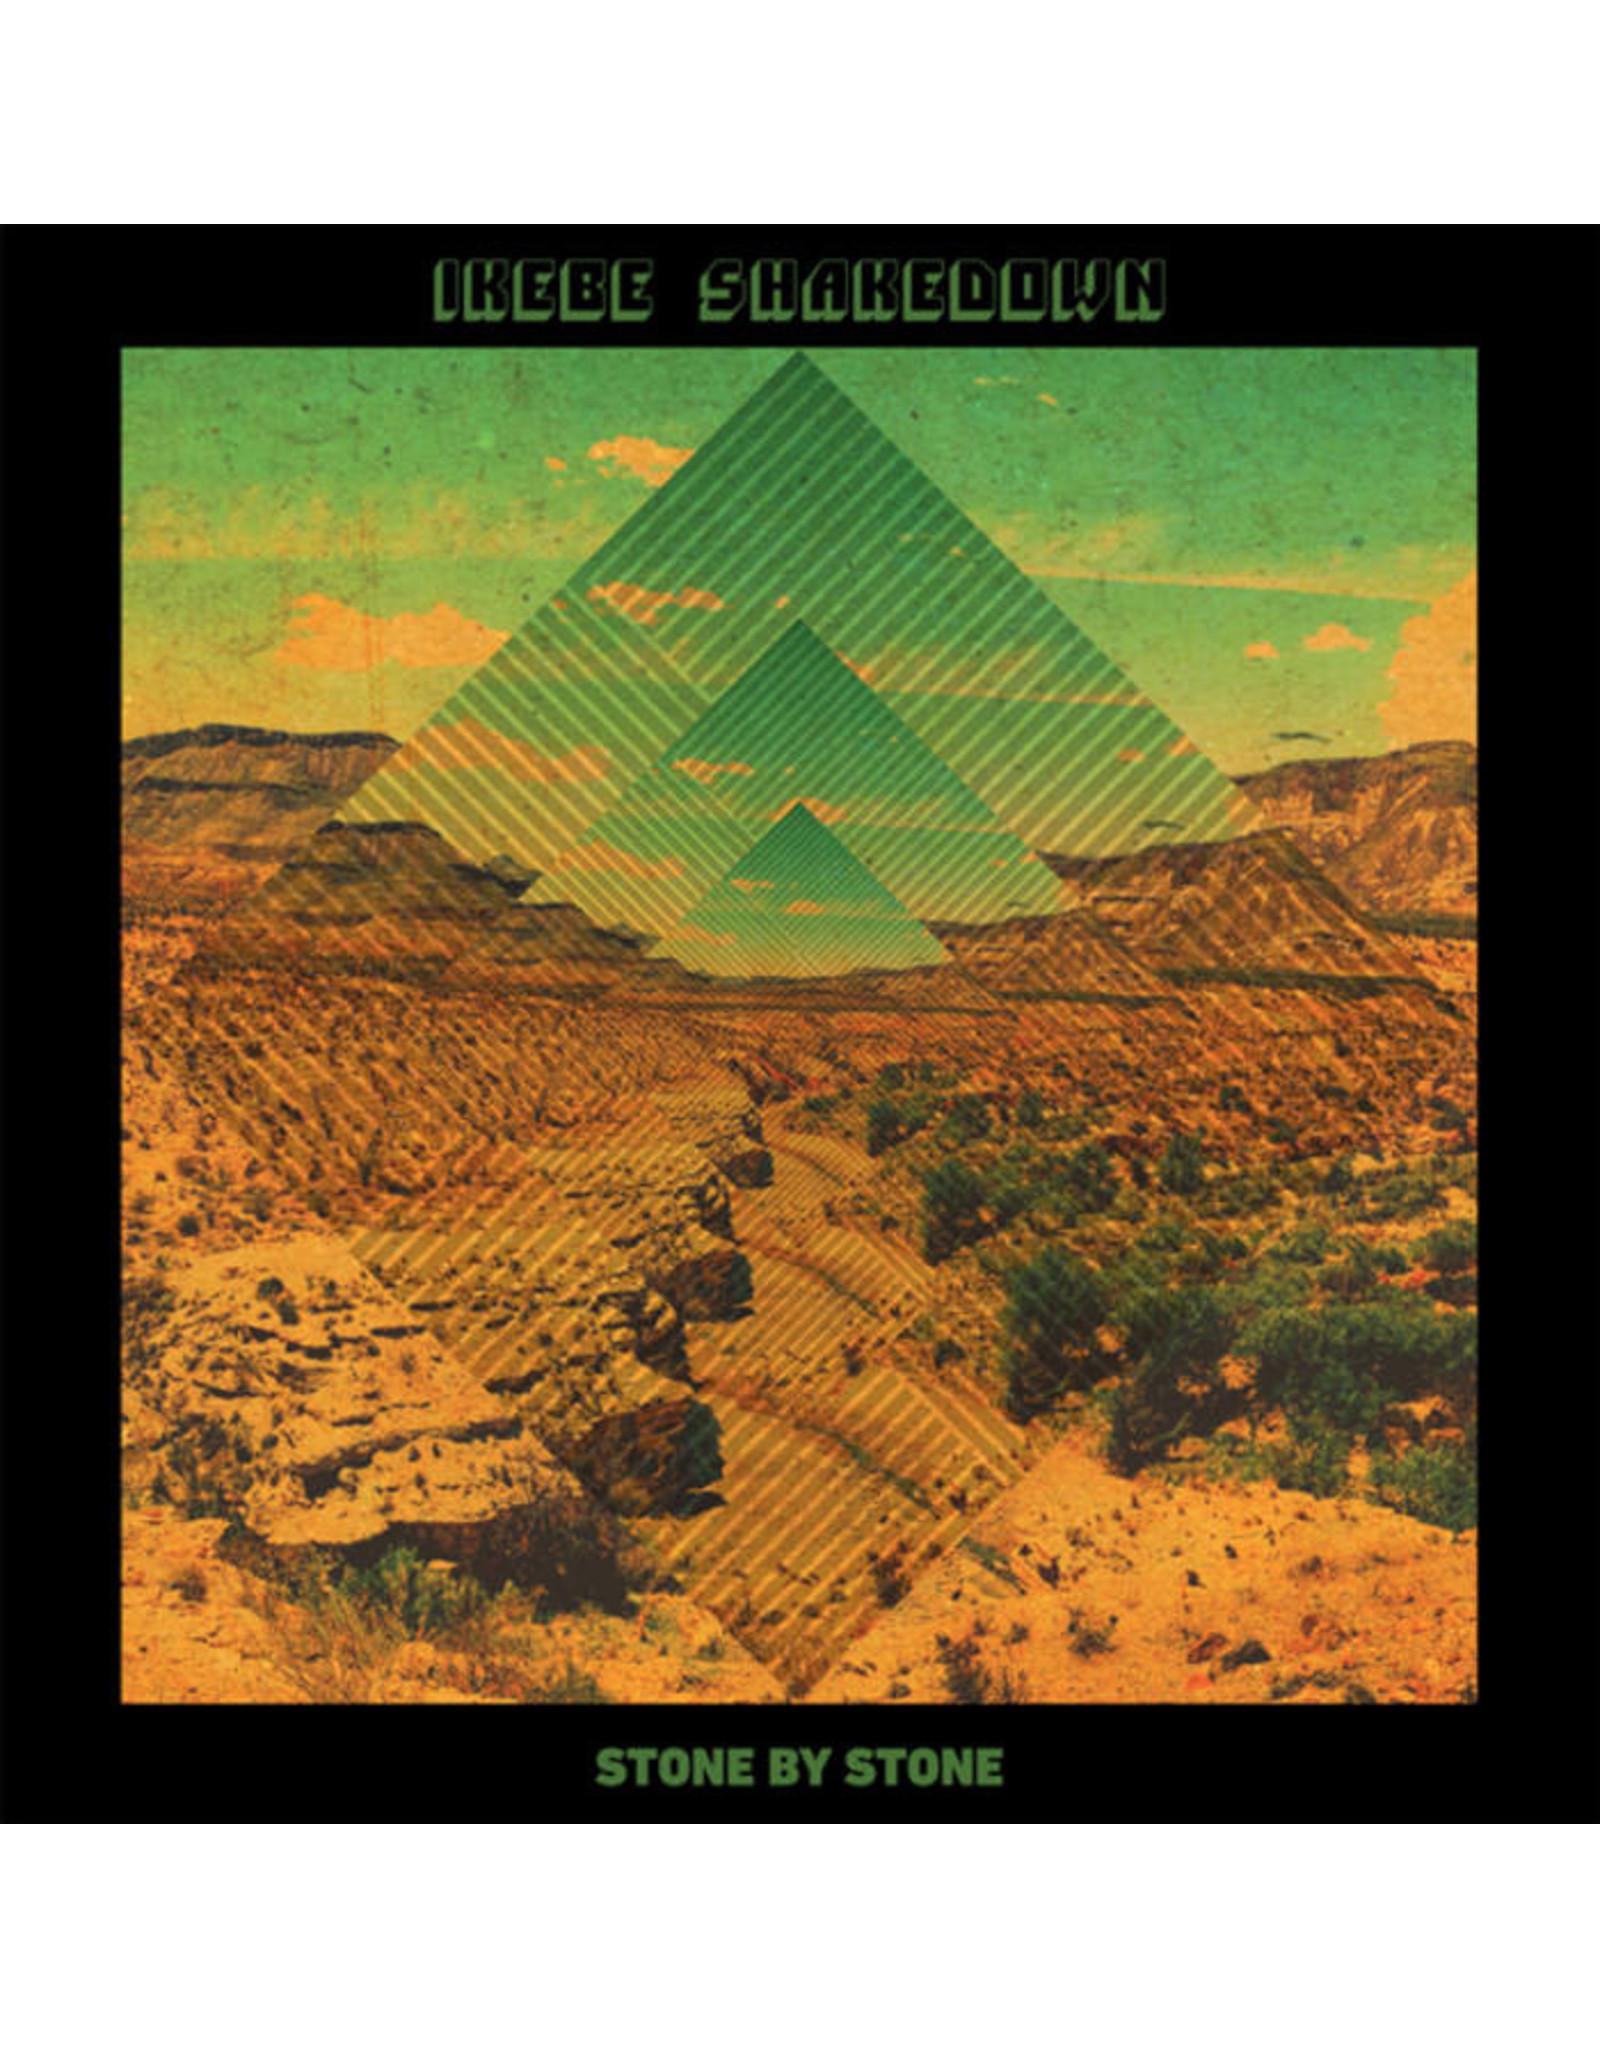 Ikebe Shakedown - Stone By Stone LP